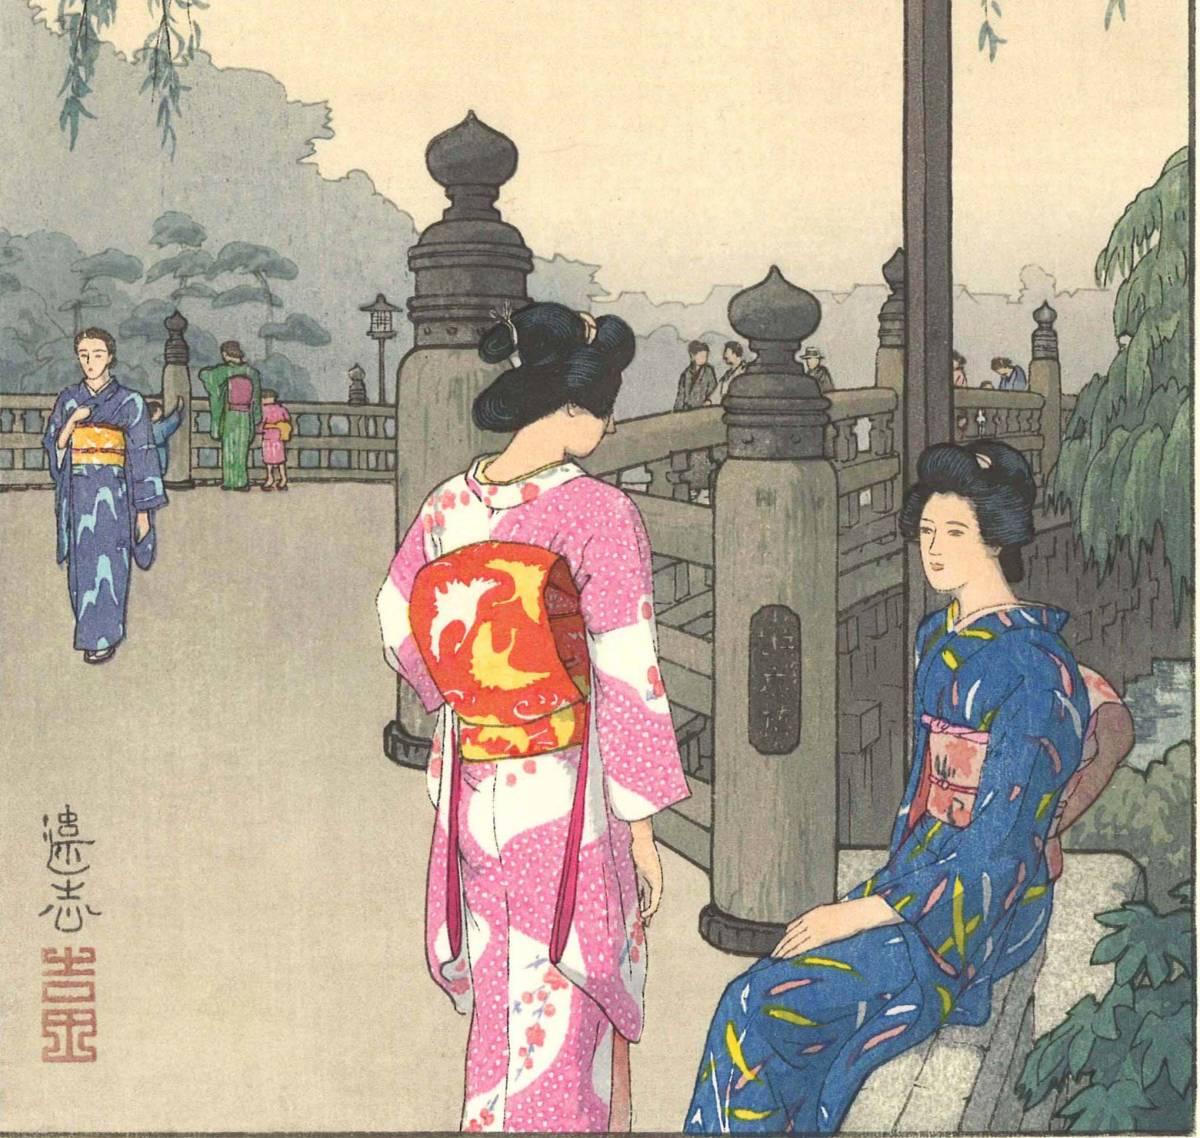 吉田遠志 木版画  014103 弁慶橋 (Benkei Bridge)  初摺1941年    最高峰の摺師の技をご堪能下さい!!_画像7